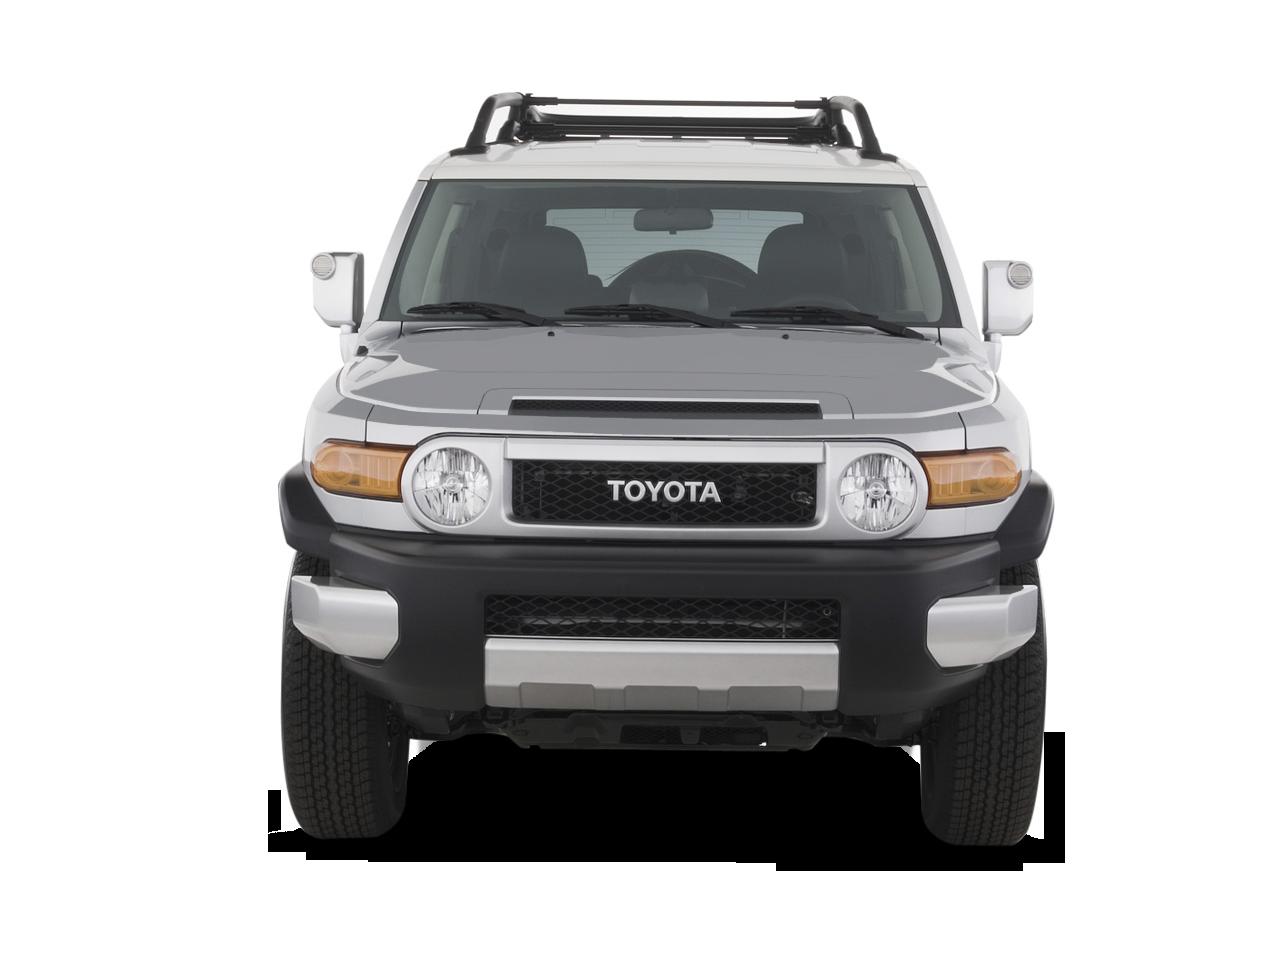 2007 Toyota FJ Cruiser - 2006 Detriot Auto Show - Automobile Magazine